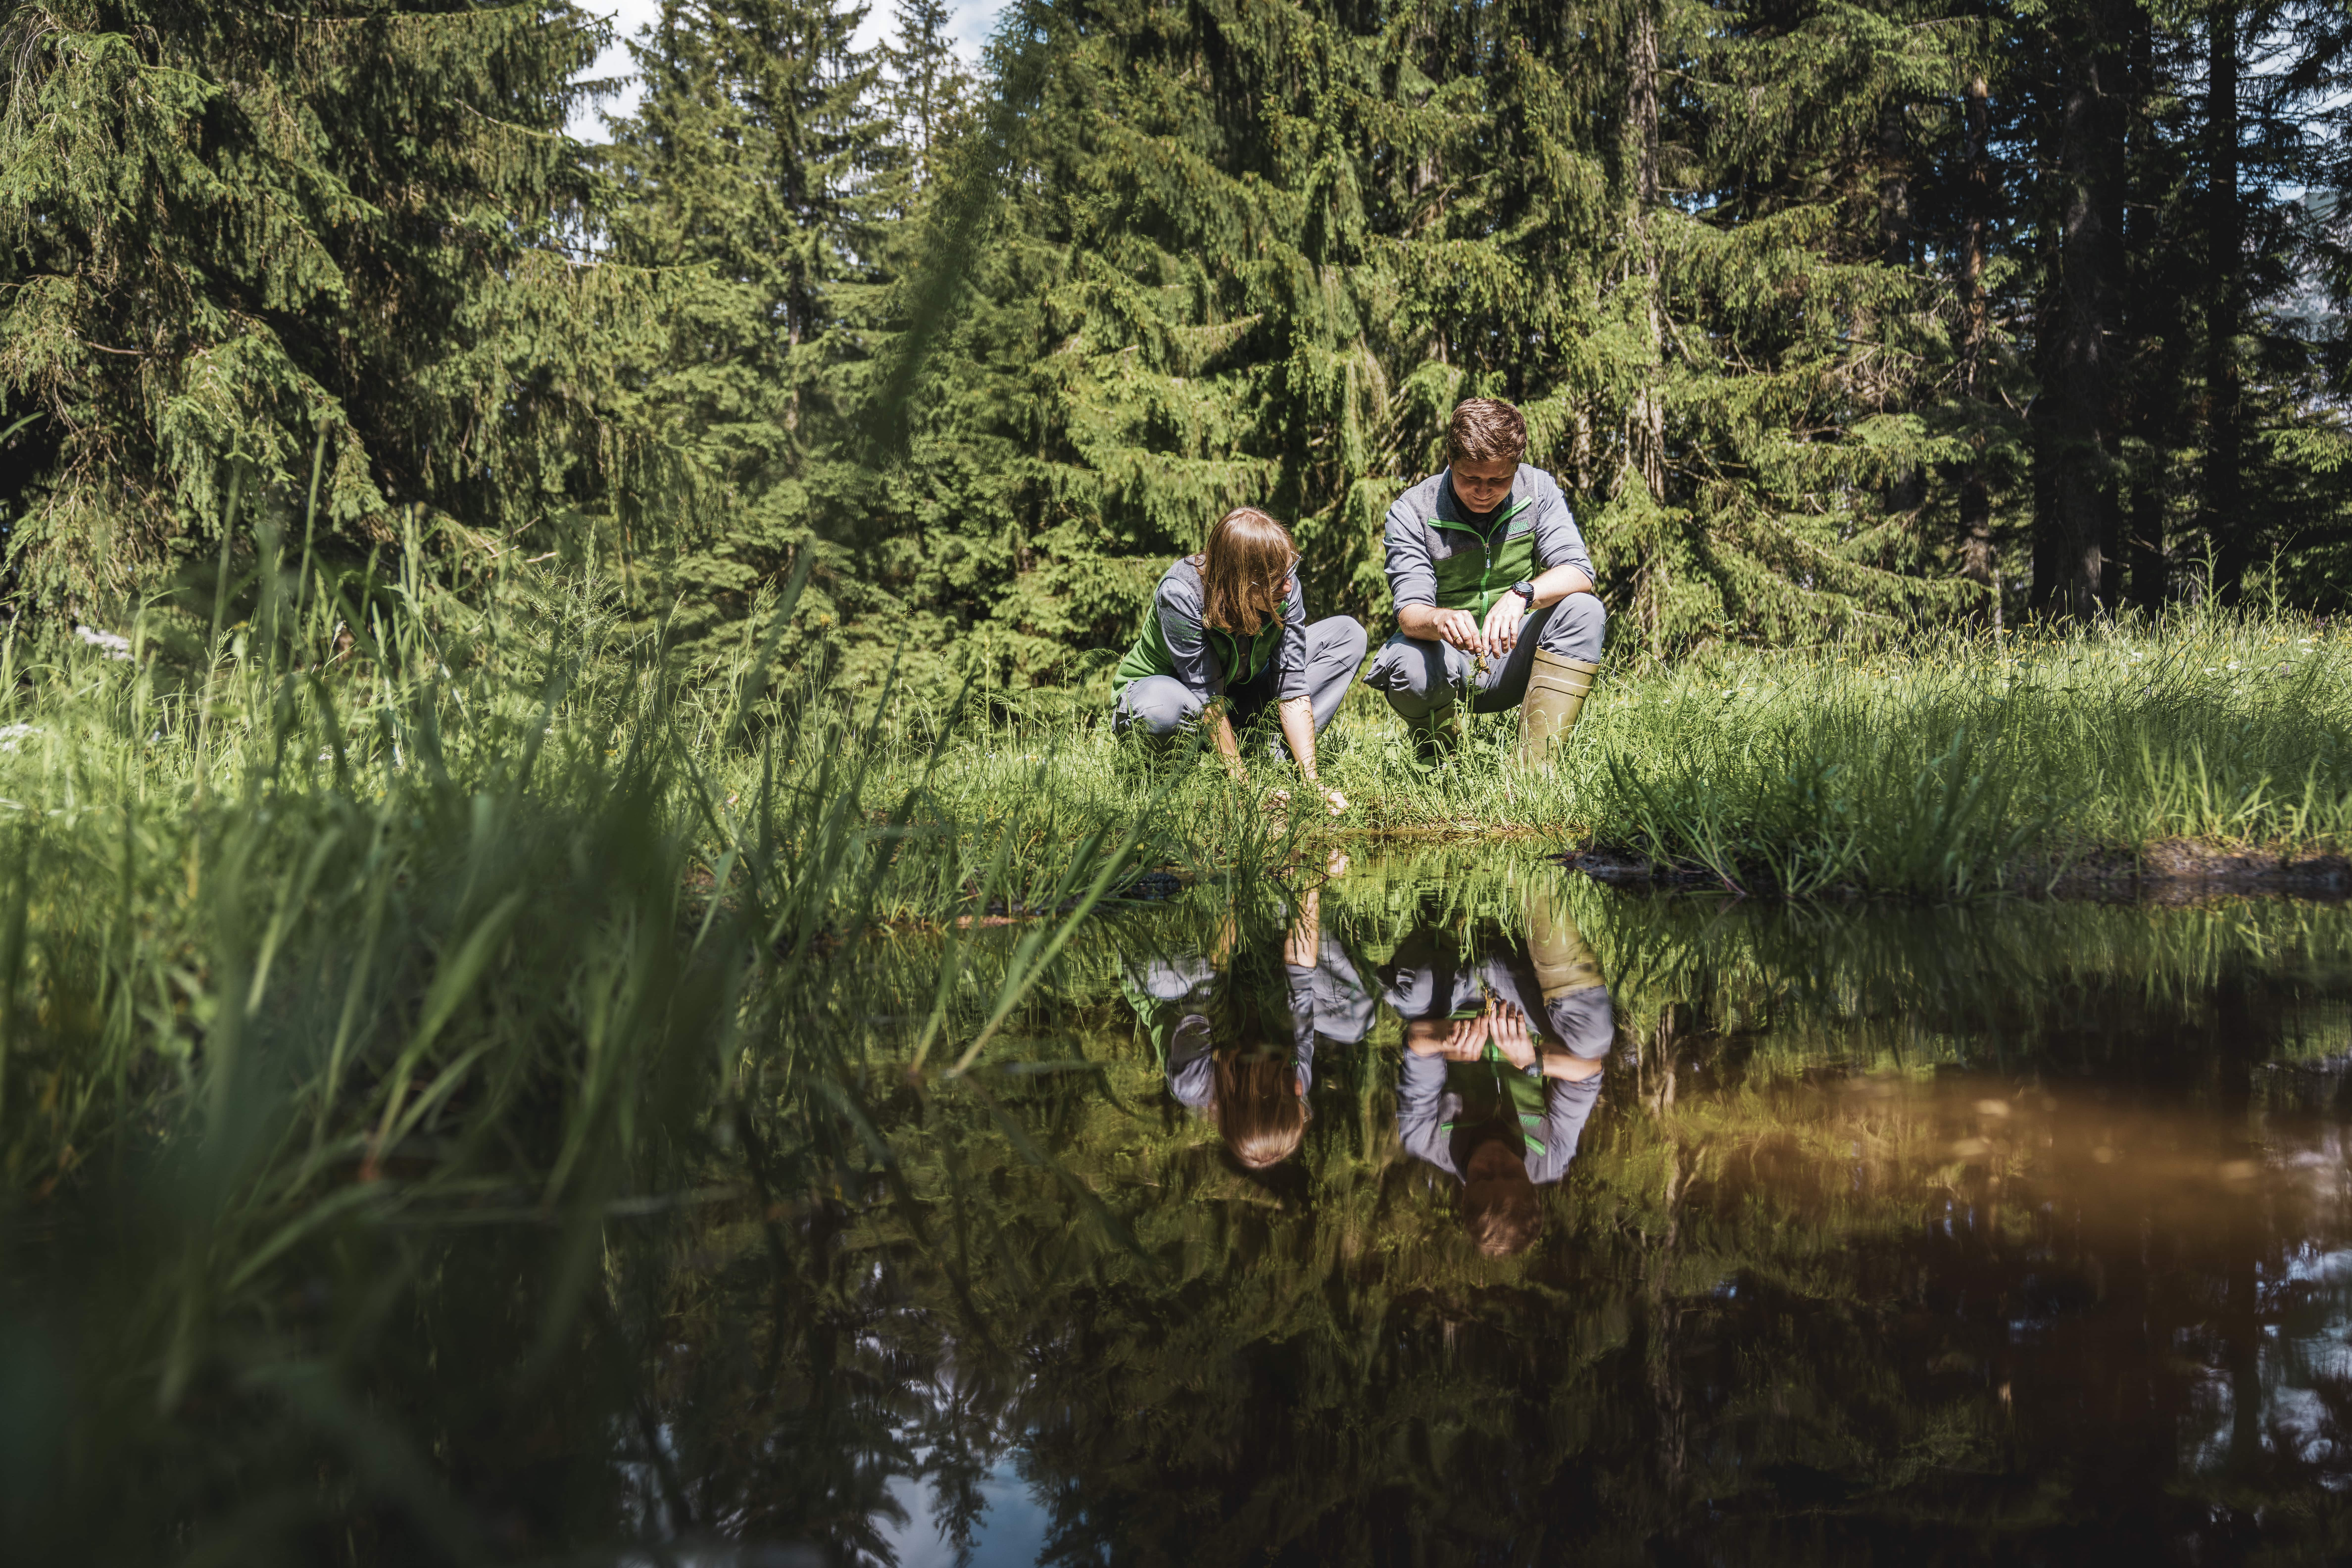 005_Nationalpark_Gesäuse_Naturschutz_Ranger©StefanLeitner_NPG-min